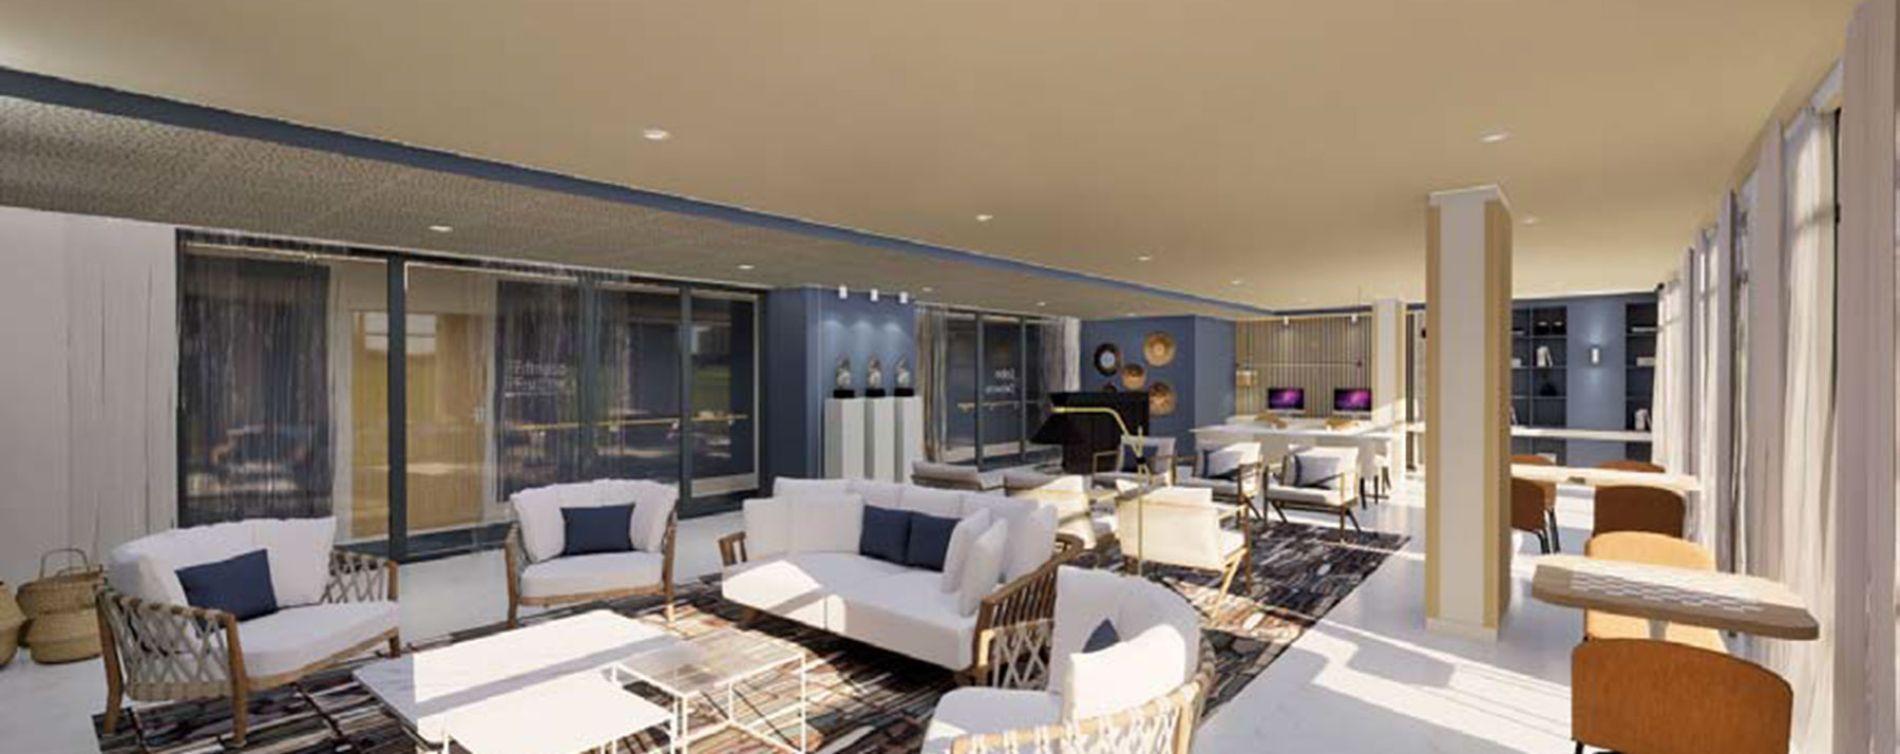 Fréjus : programme immobilier neuve « Les Balcons de la Villa Marina » (4)